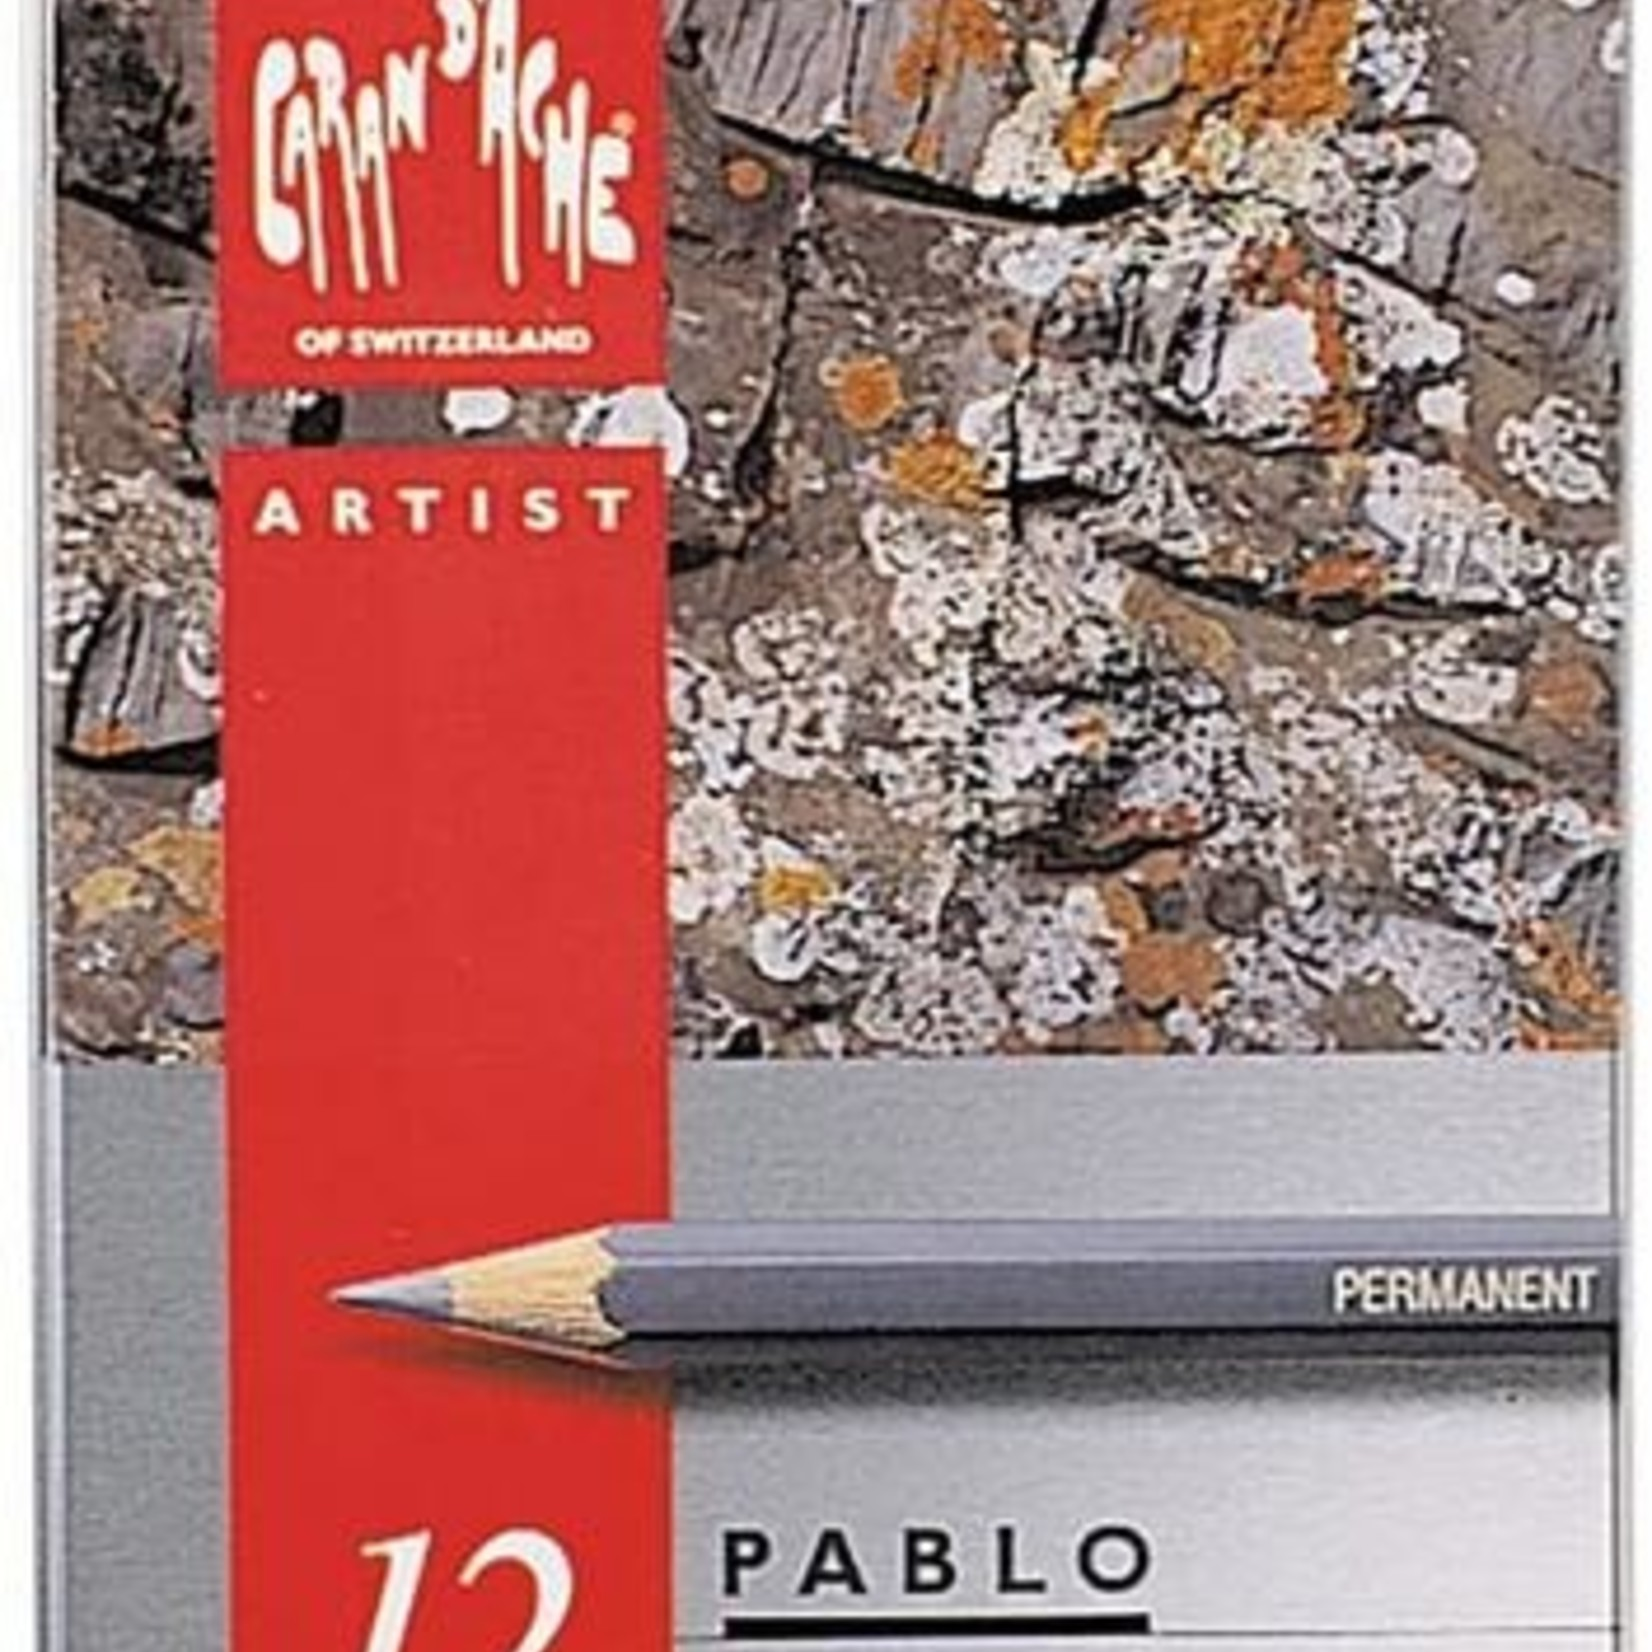 Caran d'Ache Buntstifte Artist PABLO 12er Se